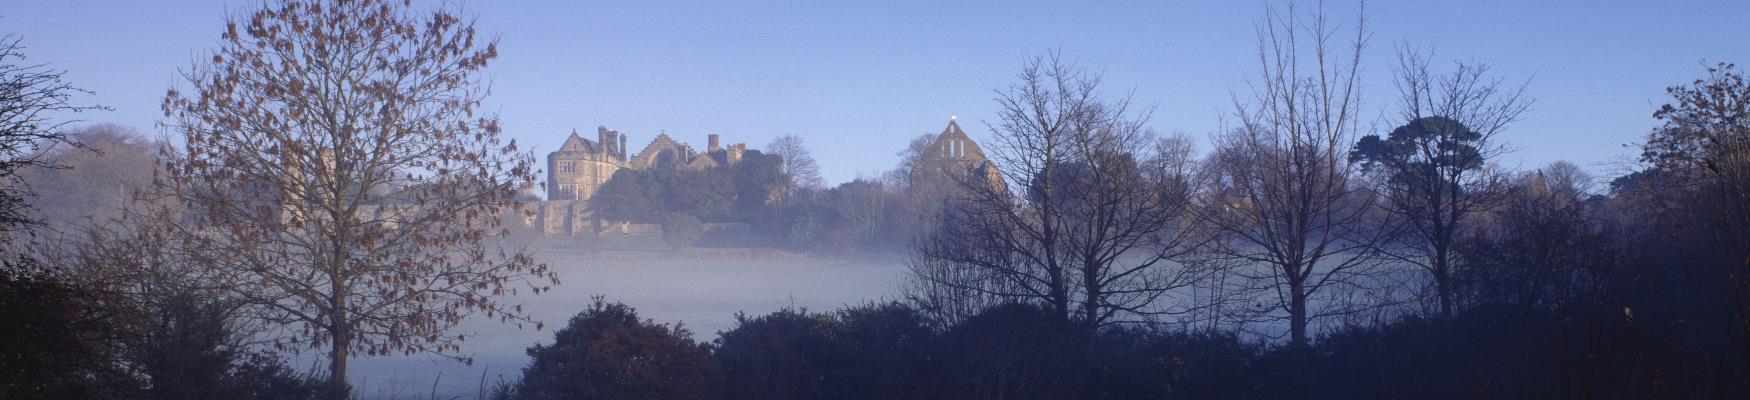 Battle Abbey in the early morning mist